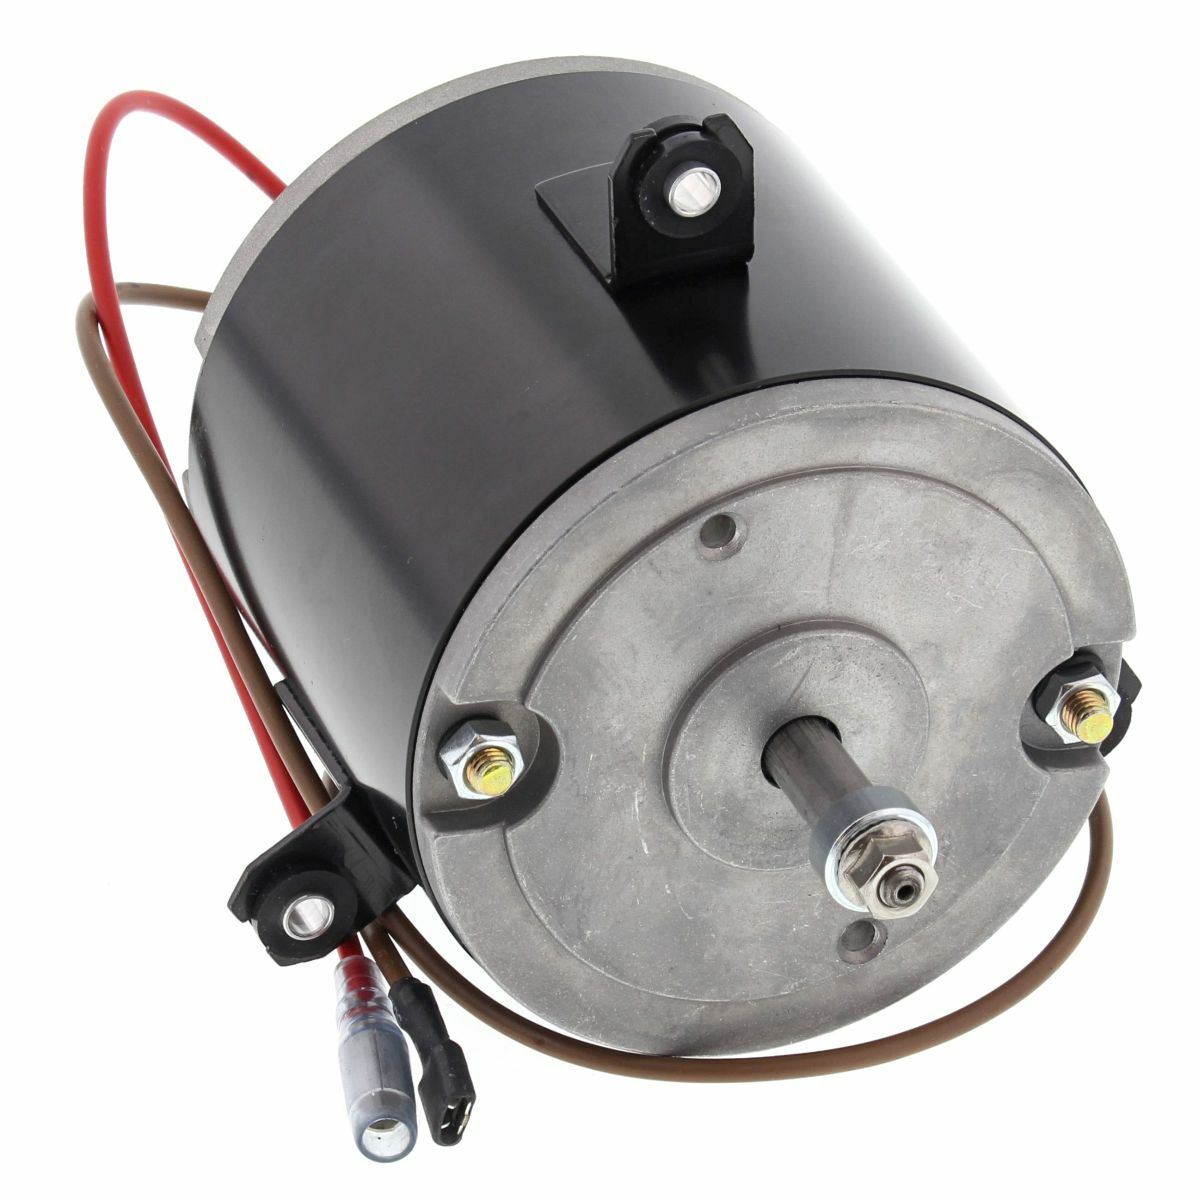 Obrázek produktu Ventilátor chladiče All Balls Racing RFM0001 70-1001